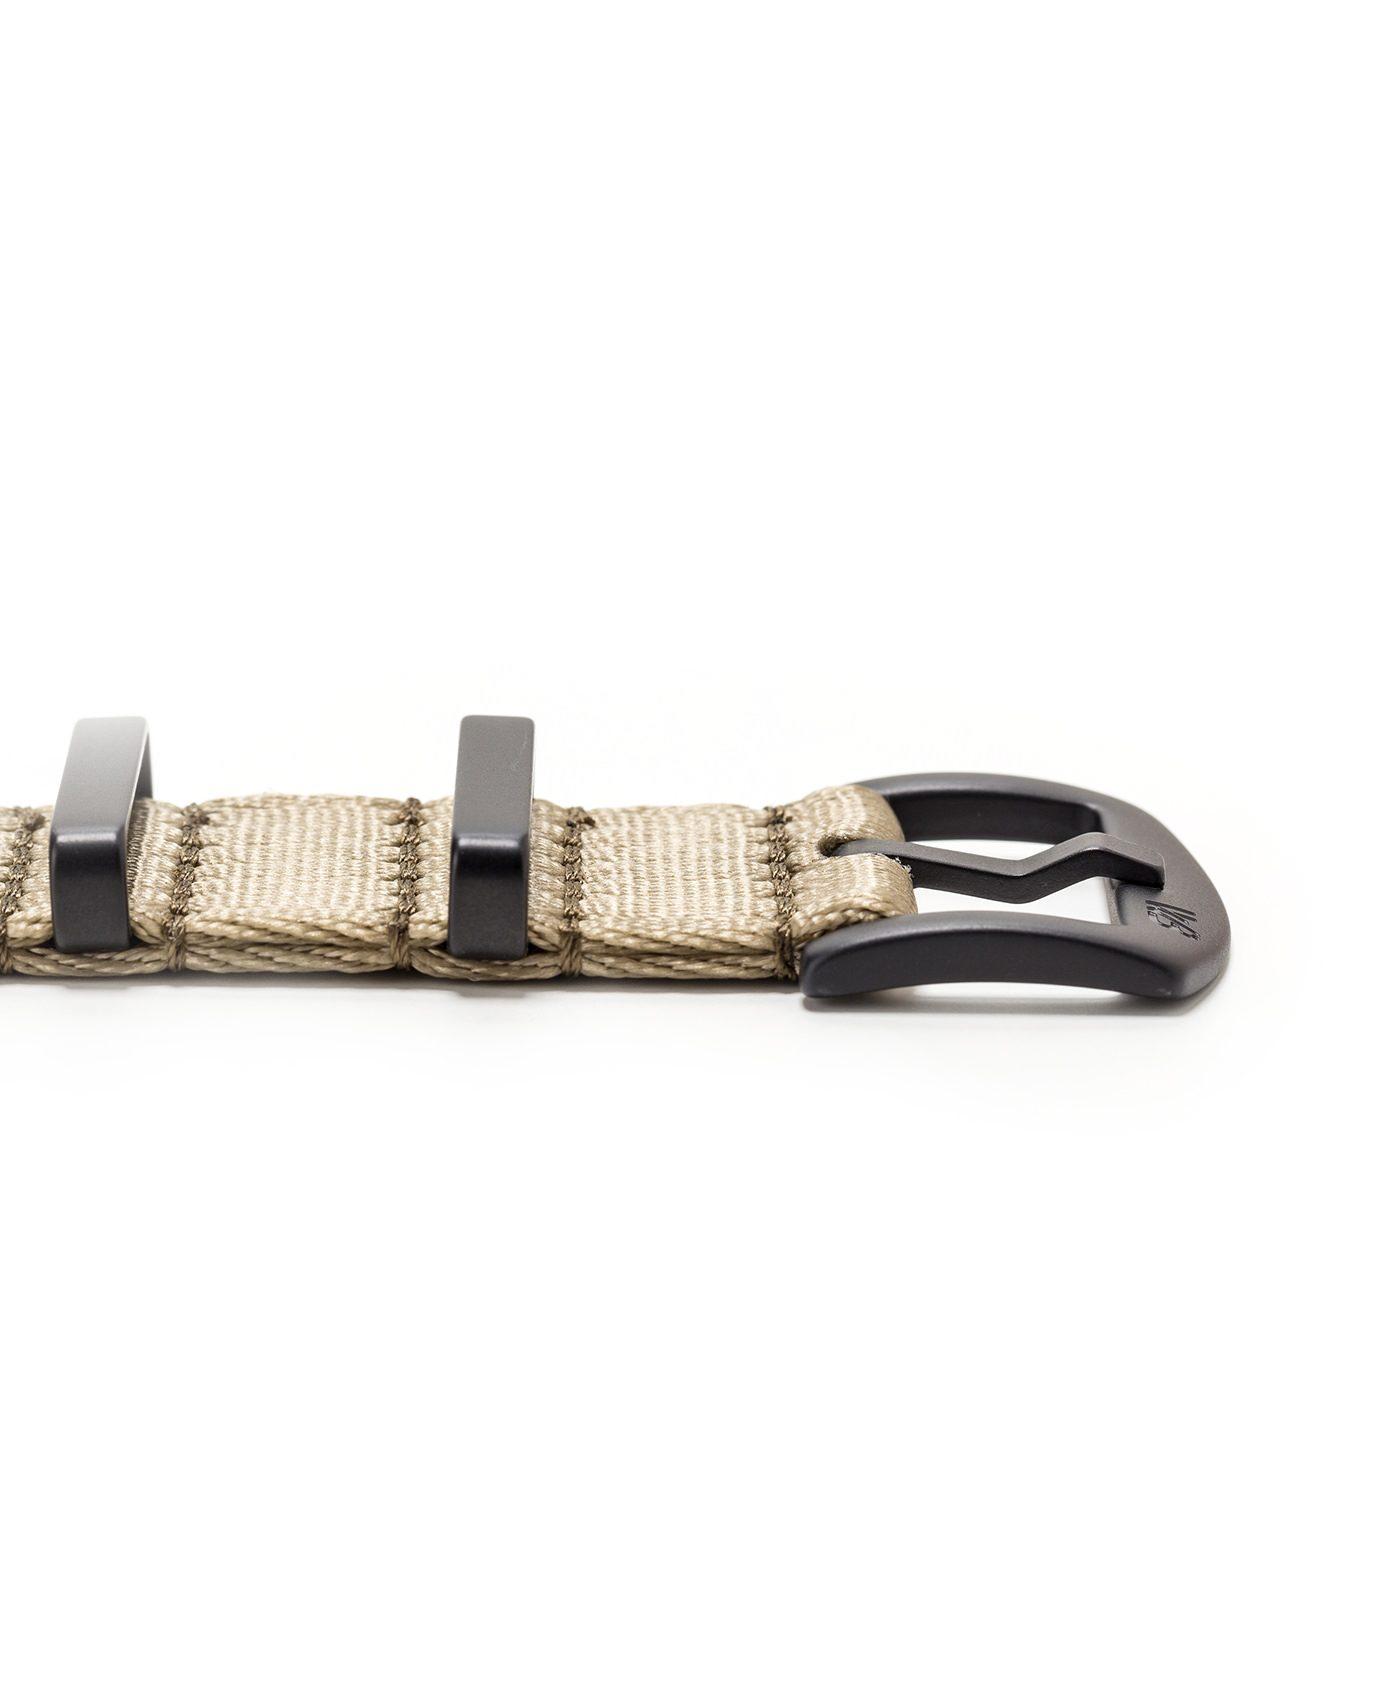 Watchbandit WB original Wristporn Nato strap in olive beige black clasp close up